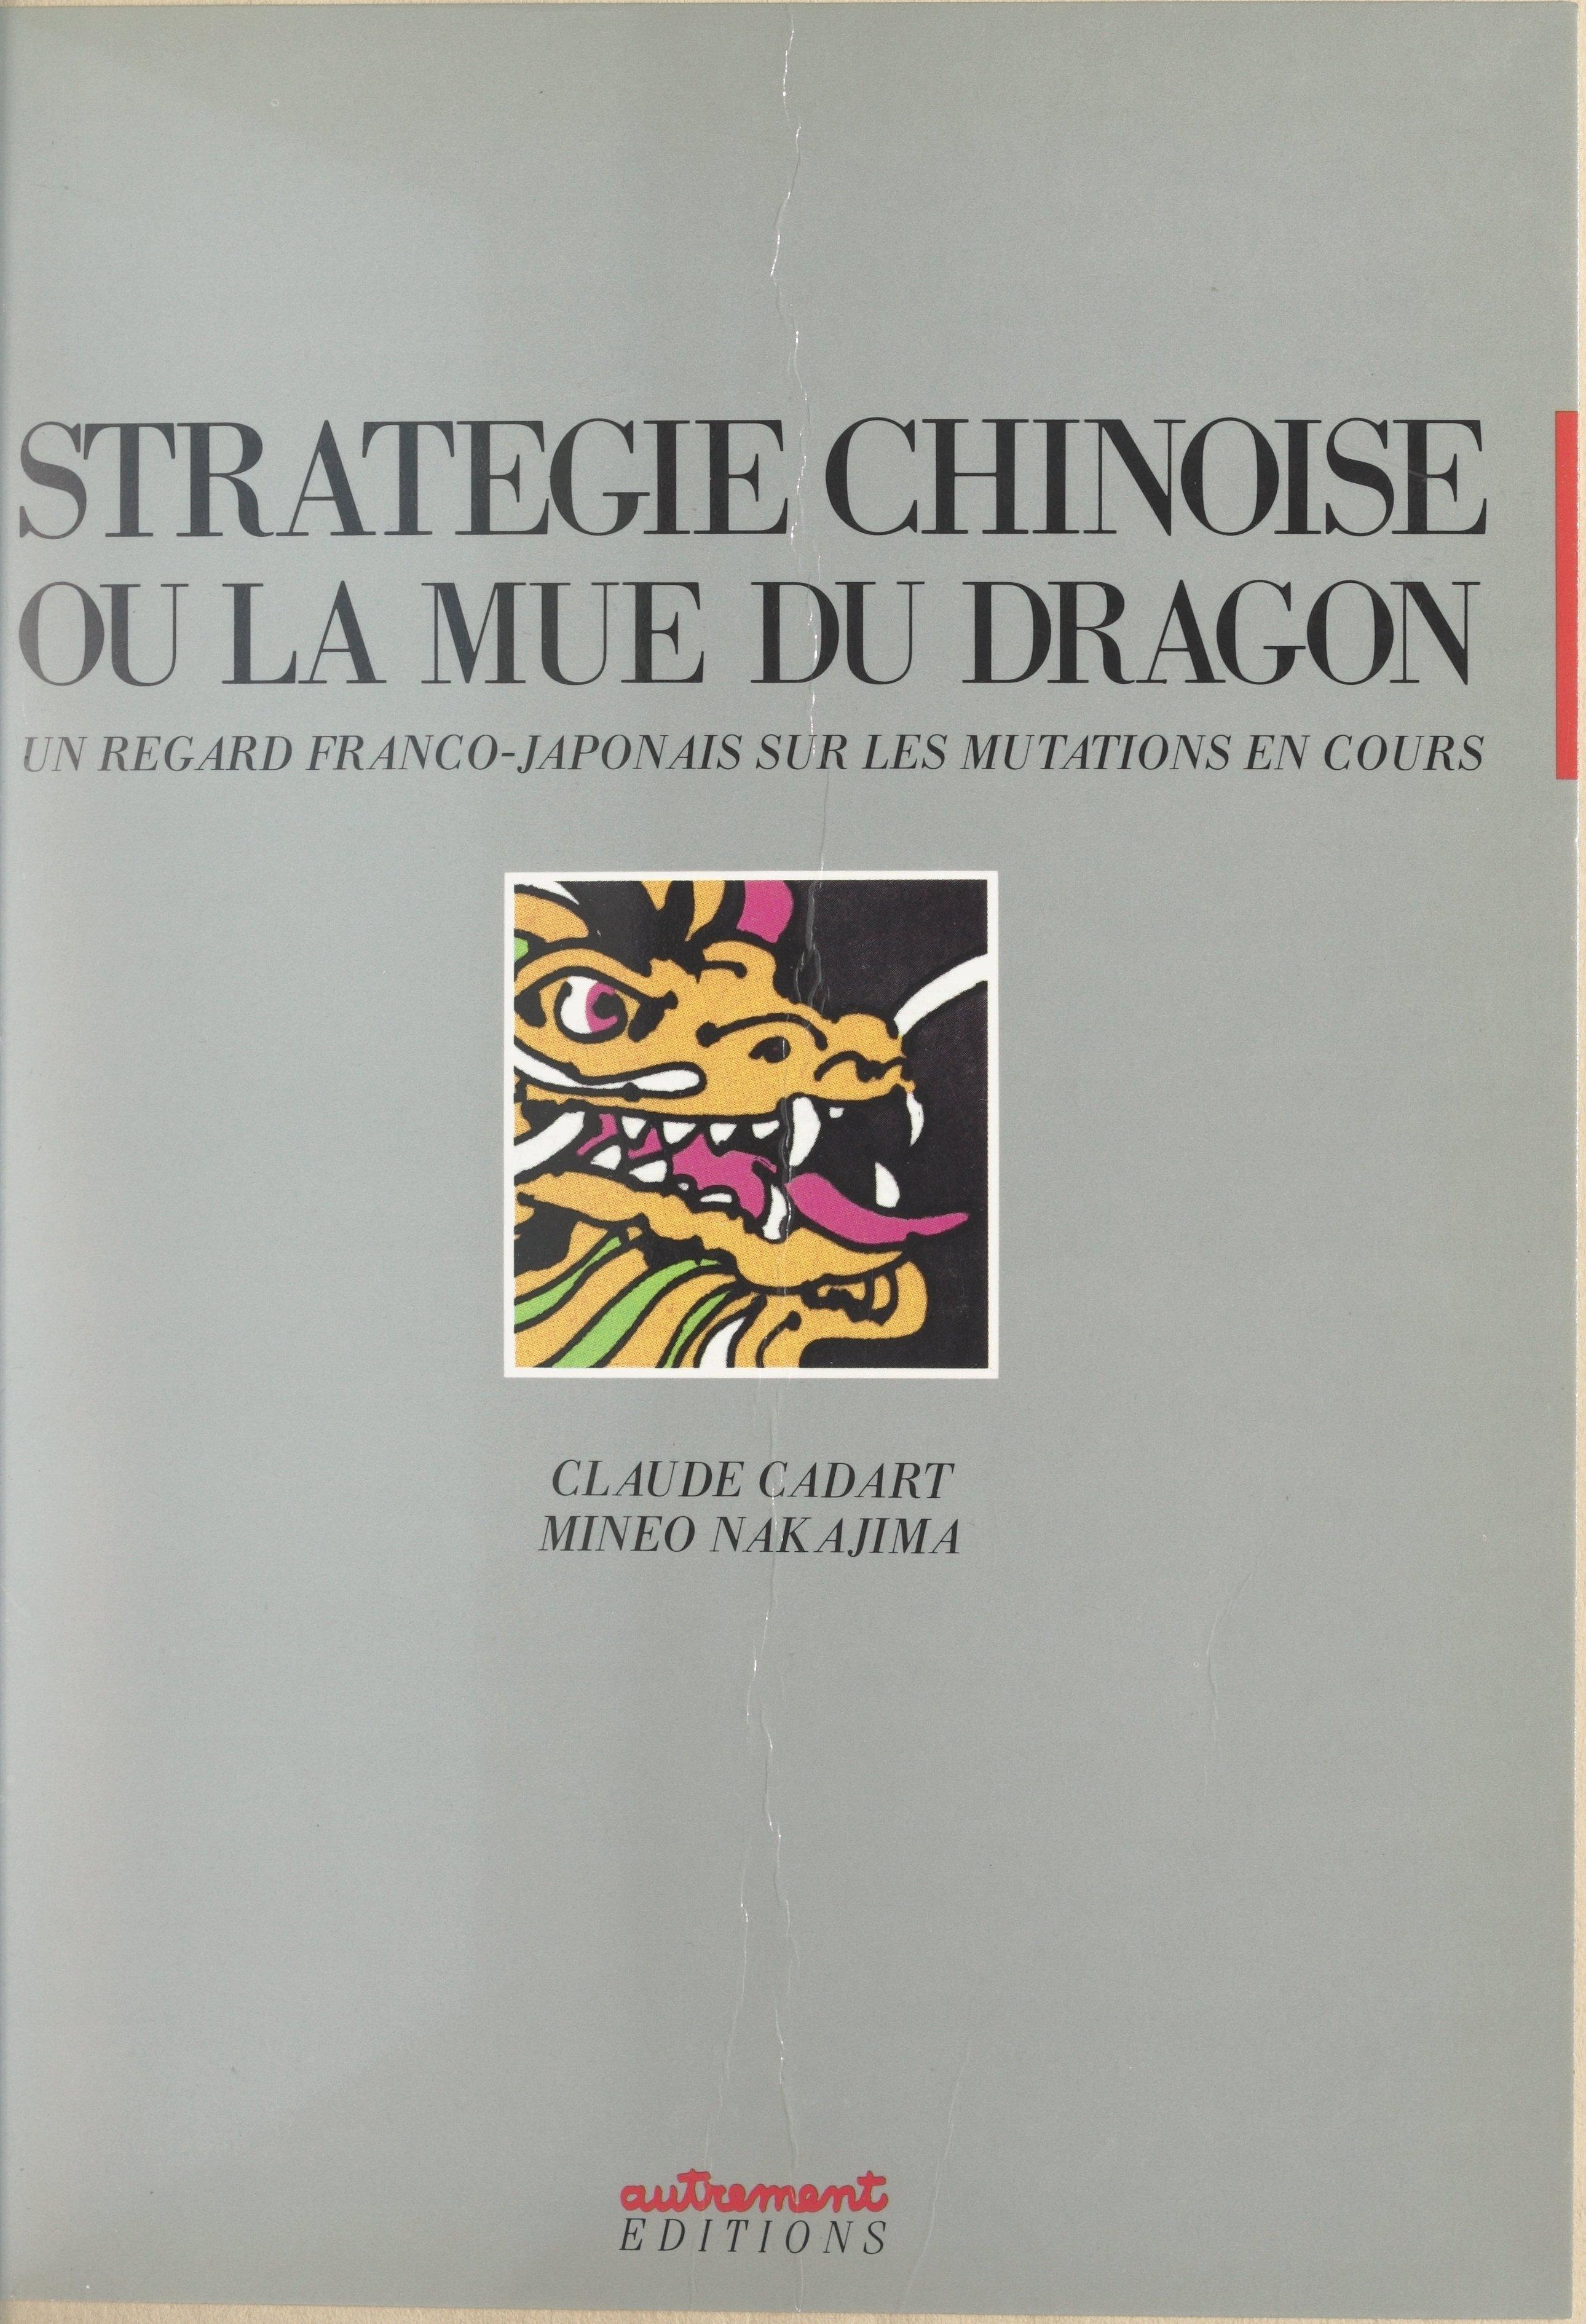 Stratégie chinoise